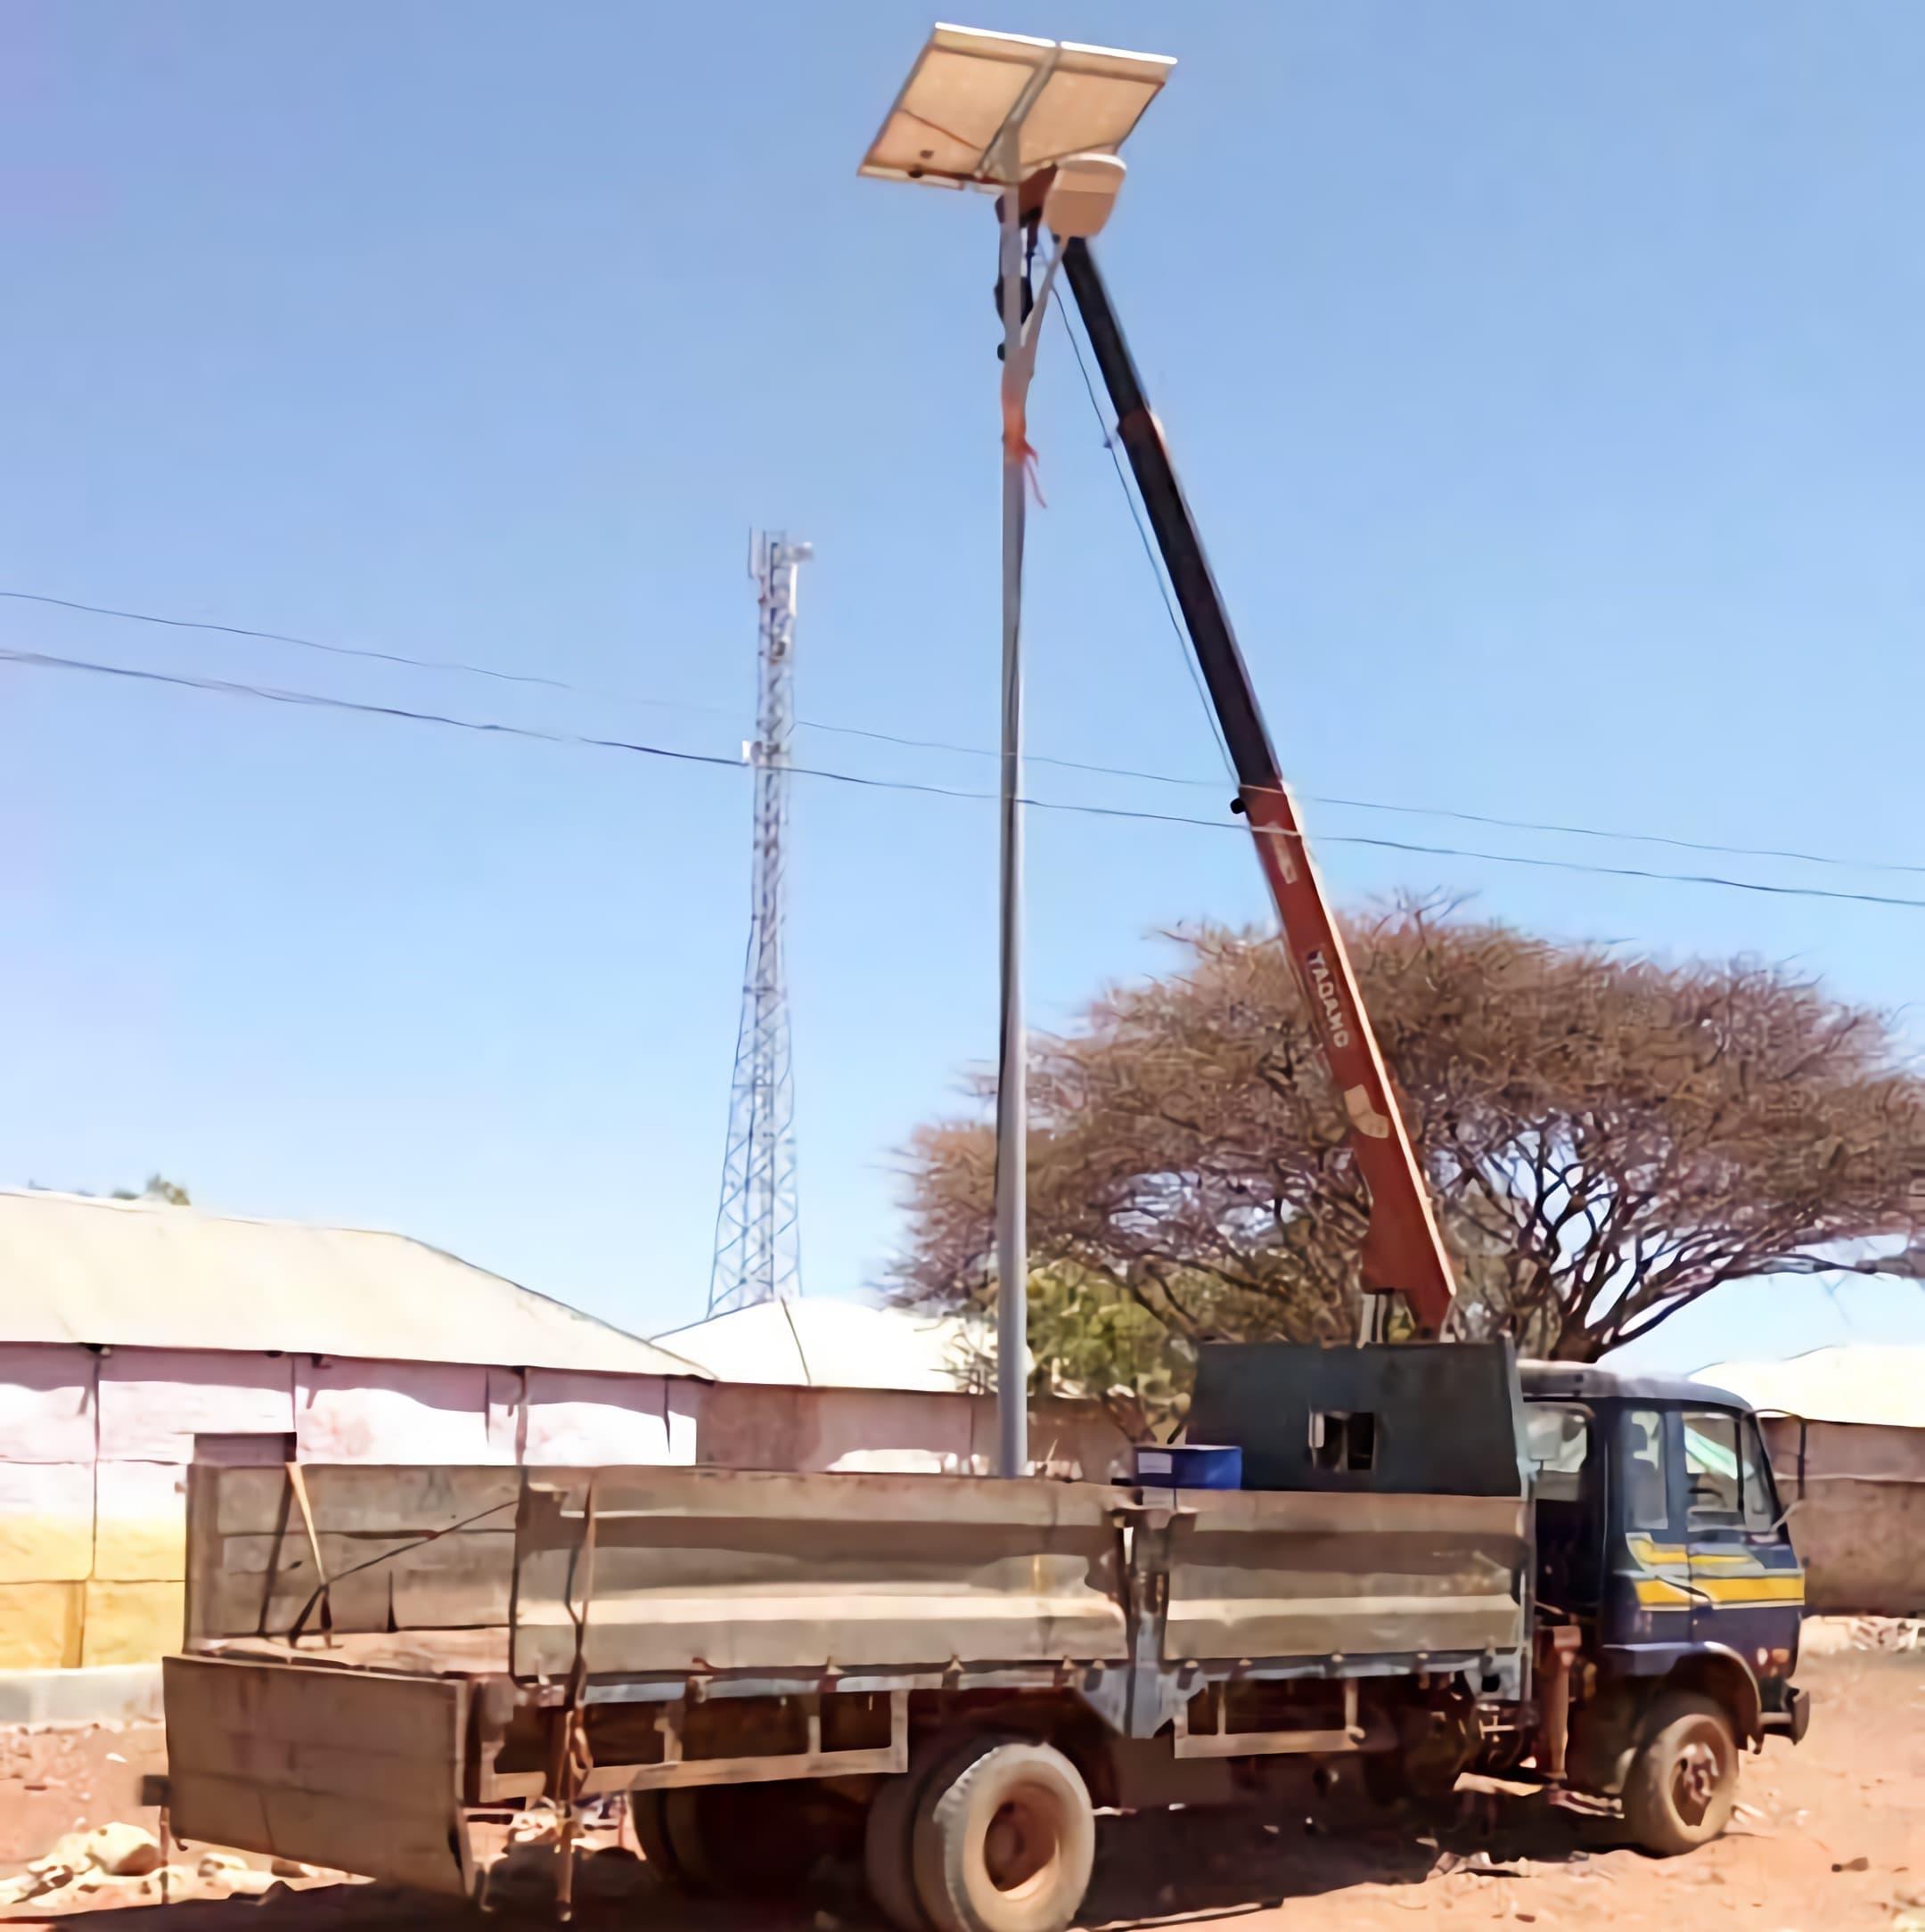 solar-street-light-system-30-watts-installation-in-Mogadishu-of-Somalia